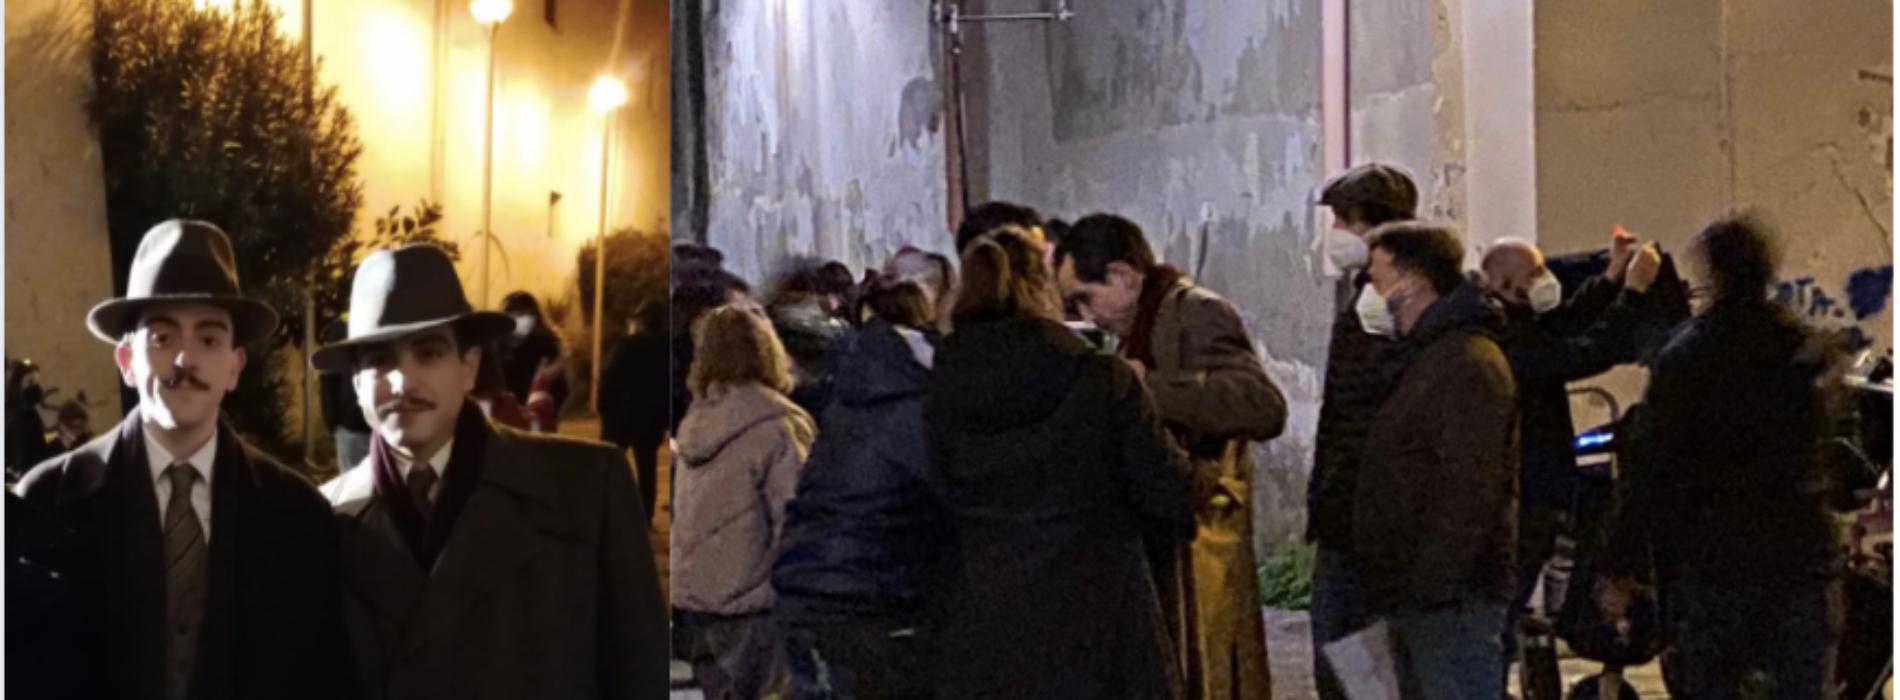 Sergio Rubini regista, le curiosità e le sorprese sul set a Capua